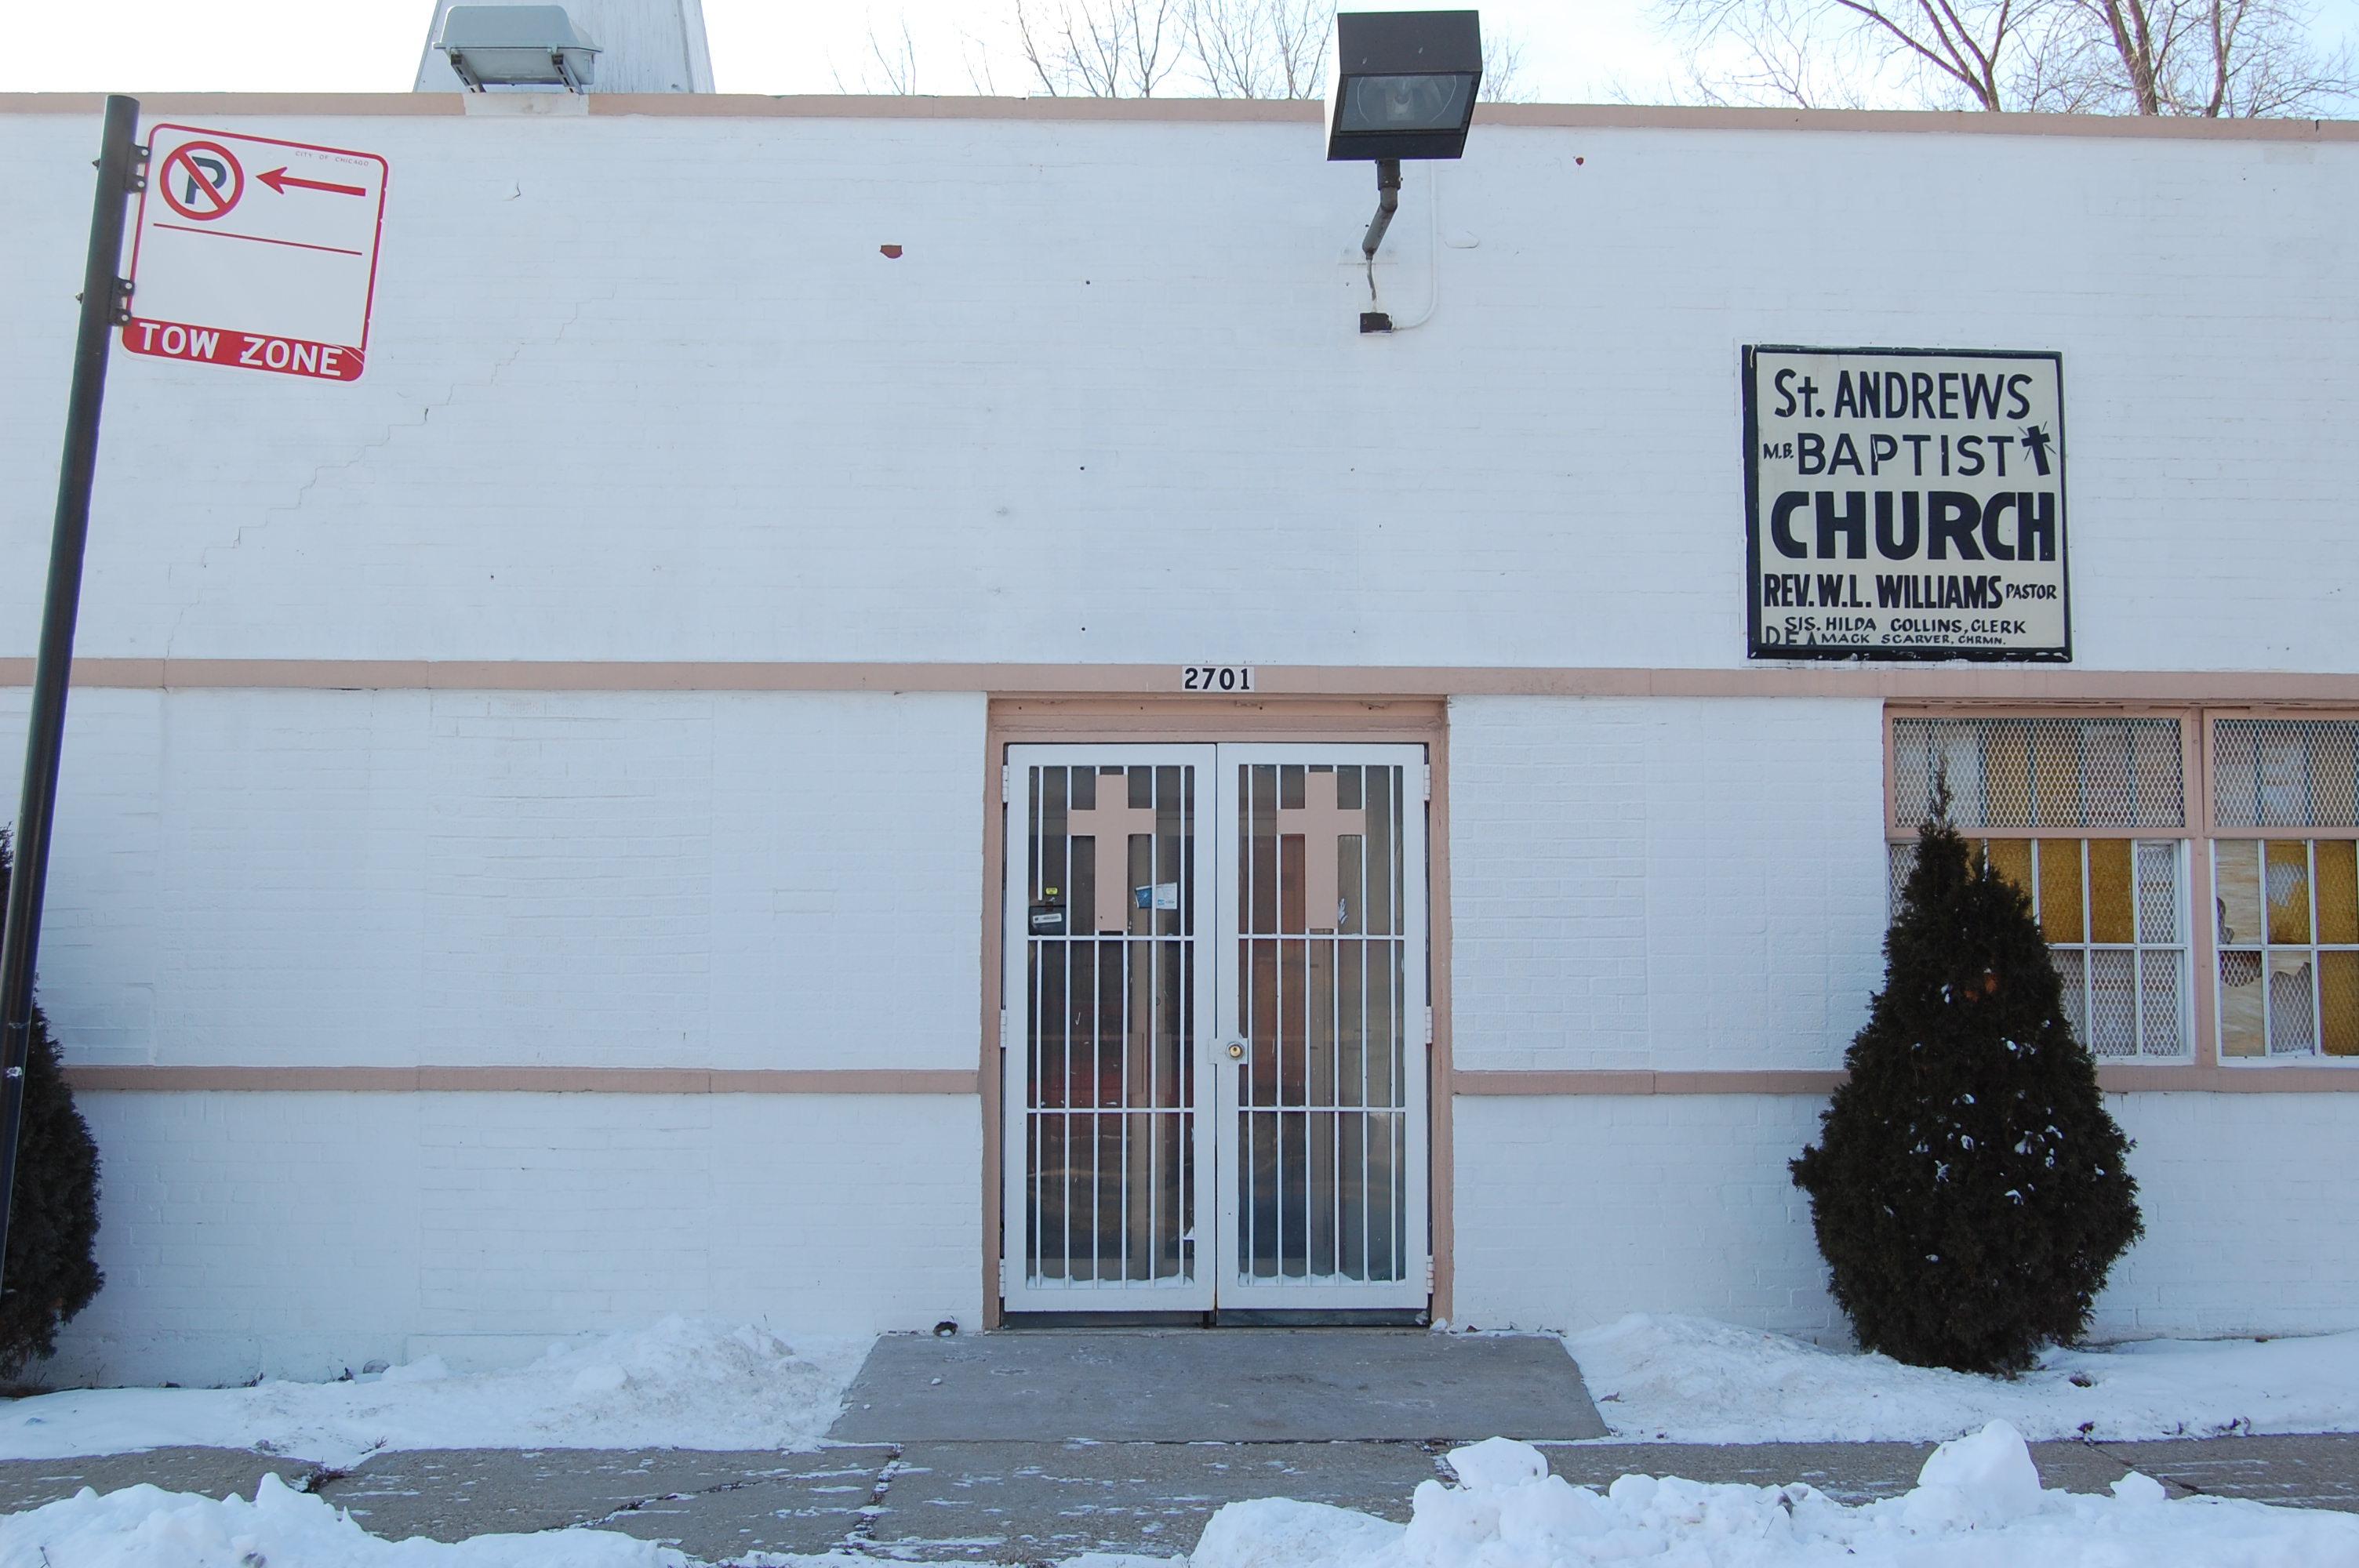 East Garfield Park church